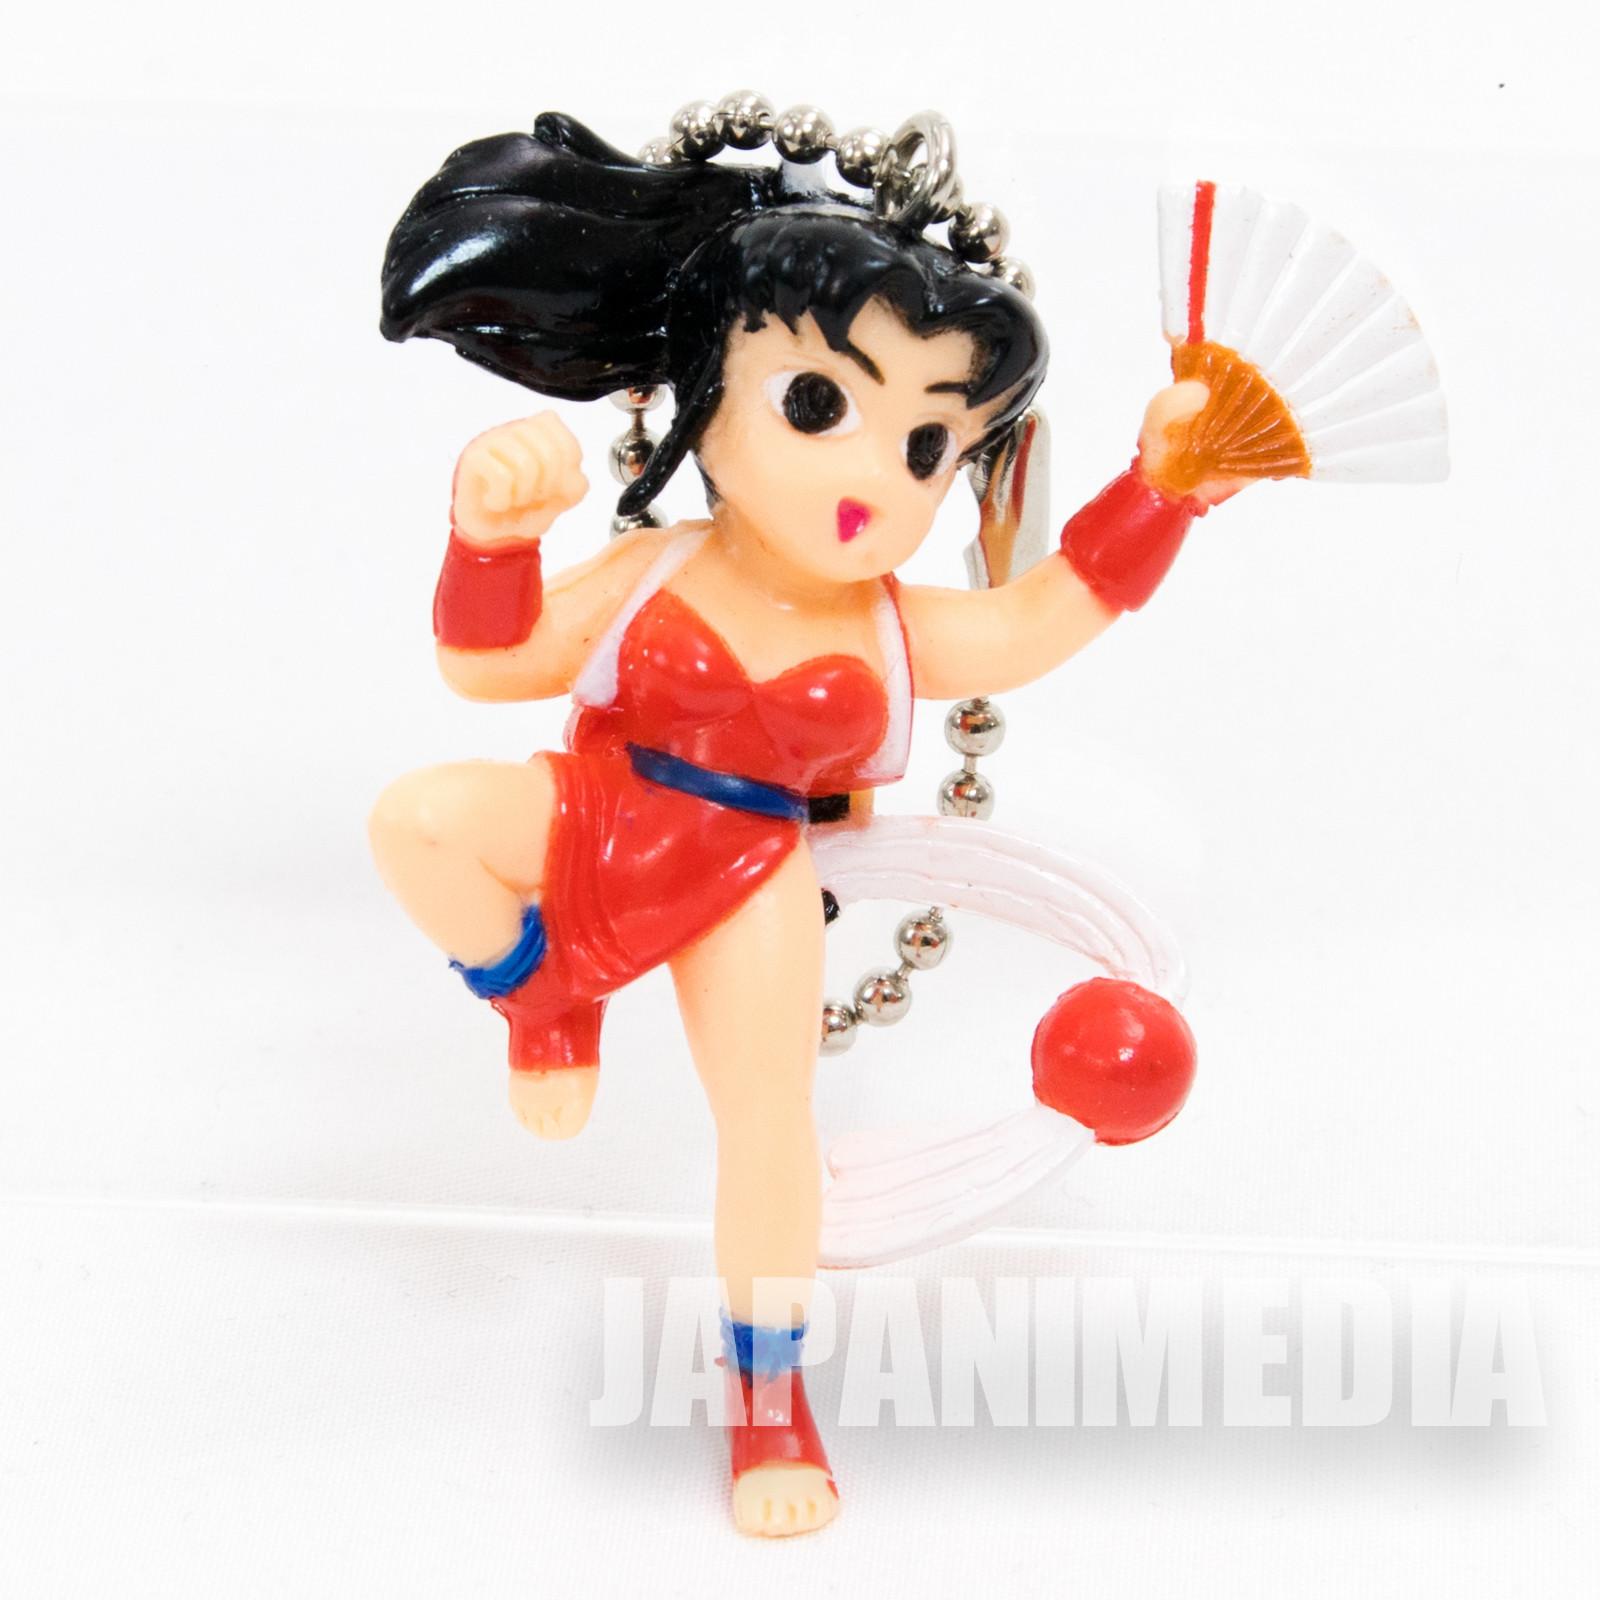 KOF King of Fighters Fatal Fury Mai Shiranui Figure Ballchain JAPAN SNK